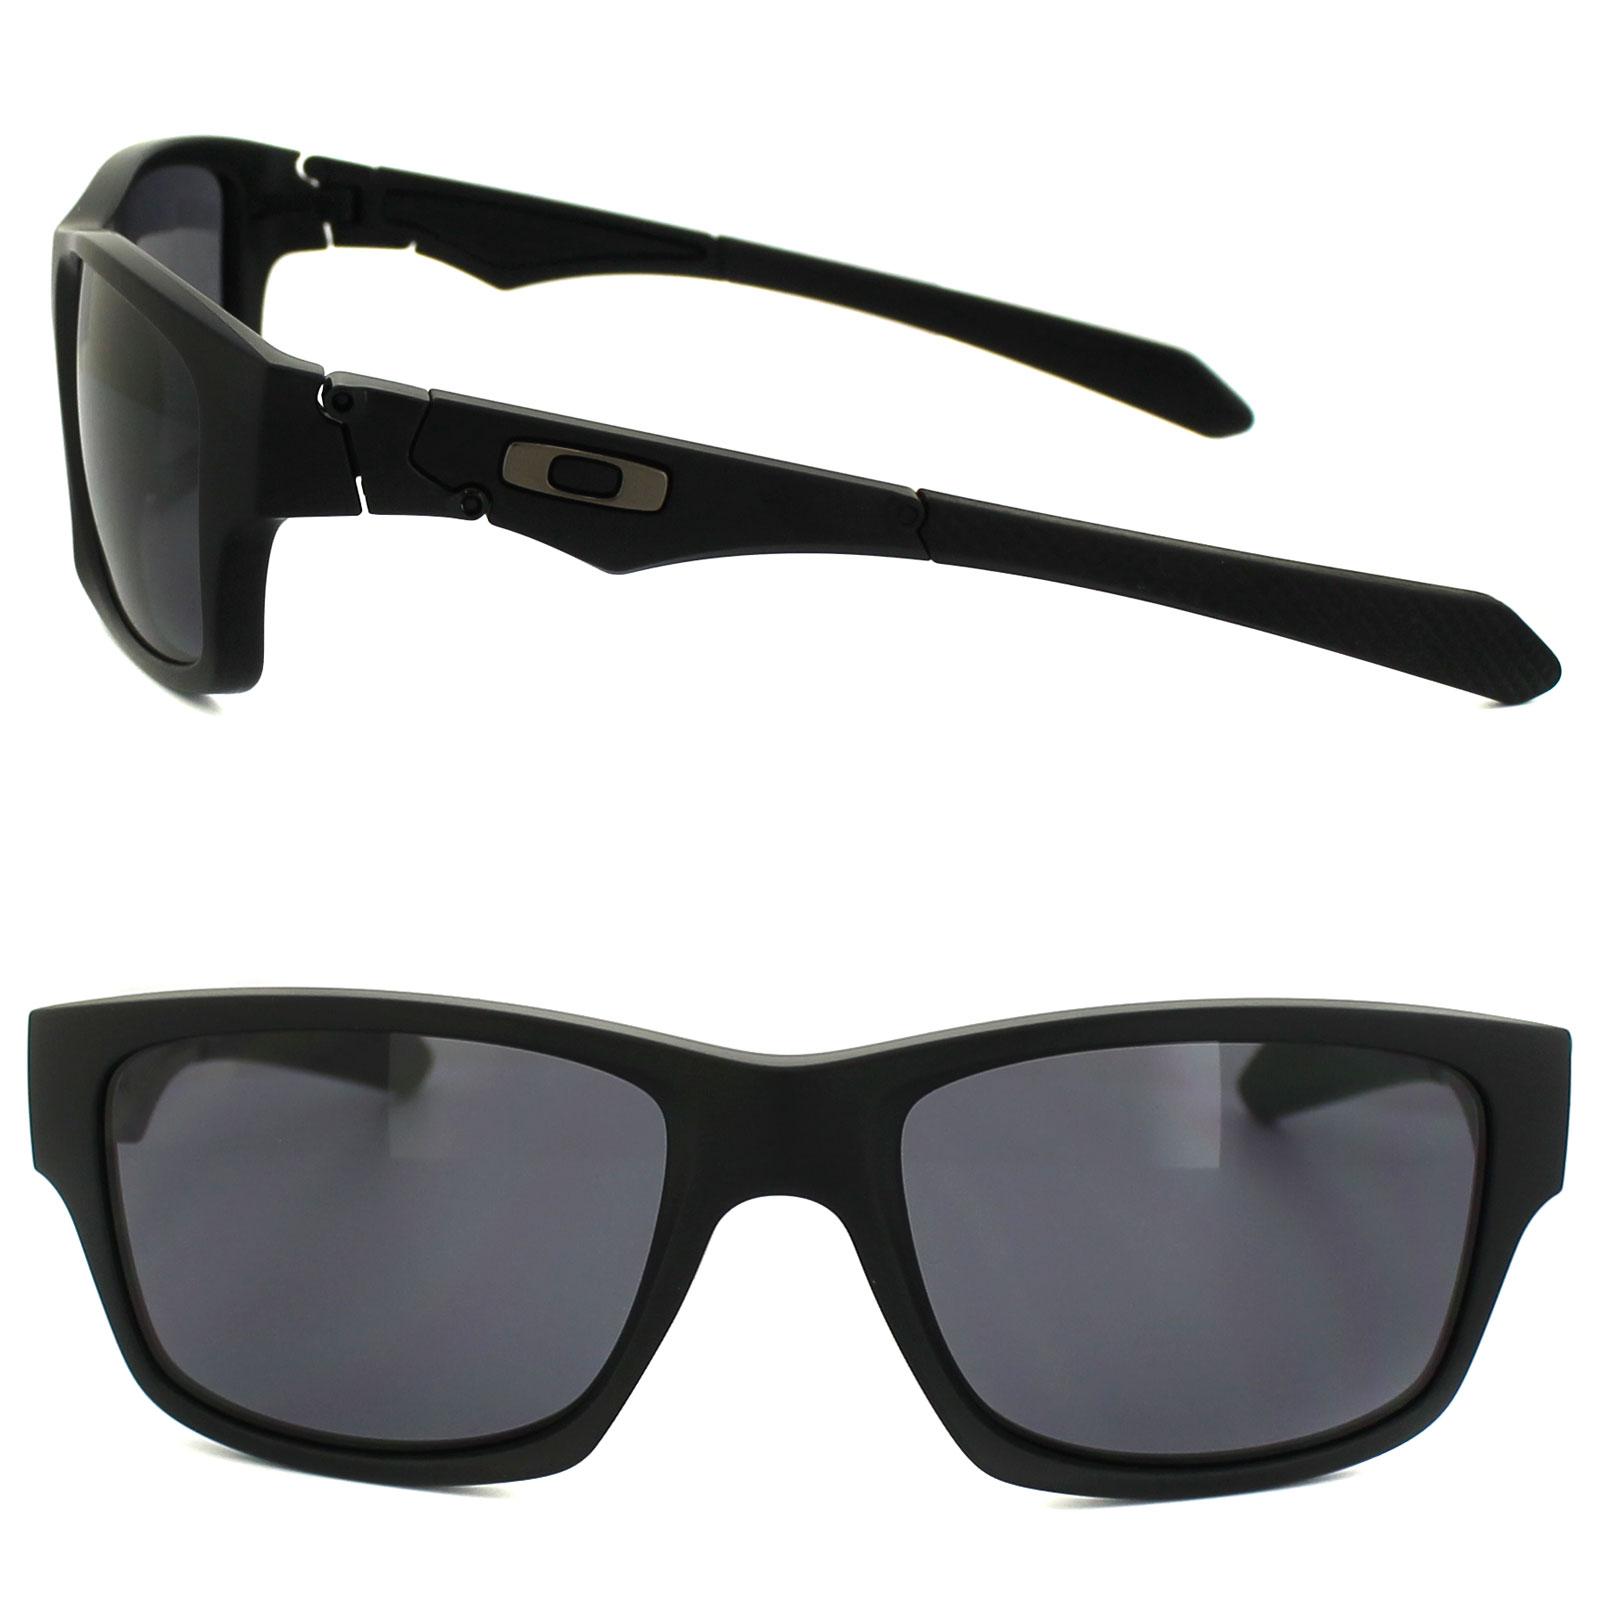 0182c09013 Sentinel Oakley Sunglasses Jupiter Squared OO9135-25 Matt Black Grey